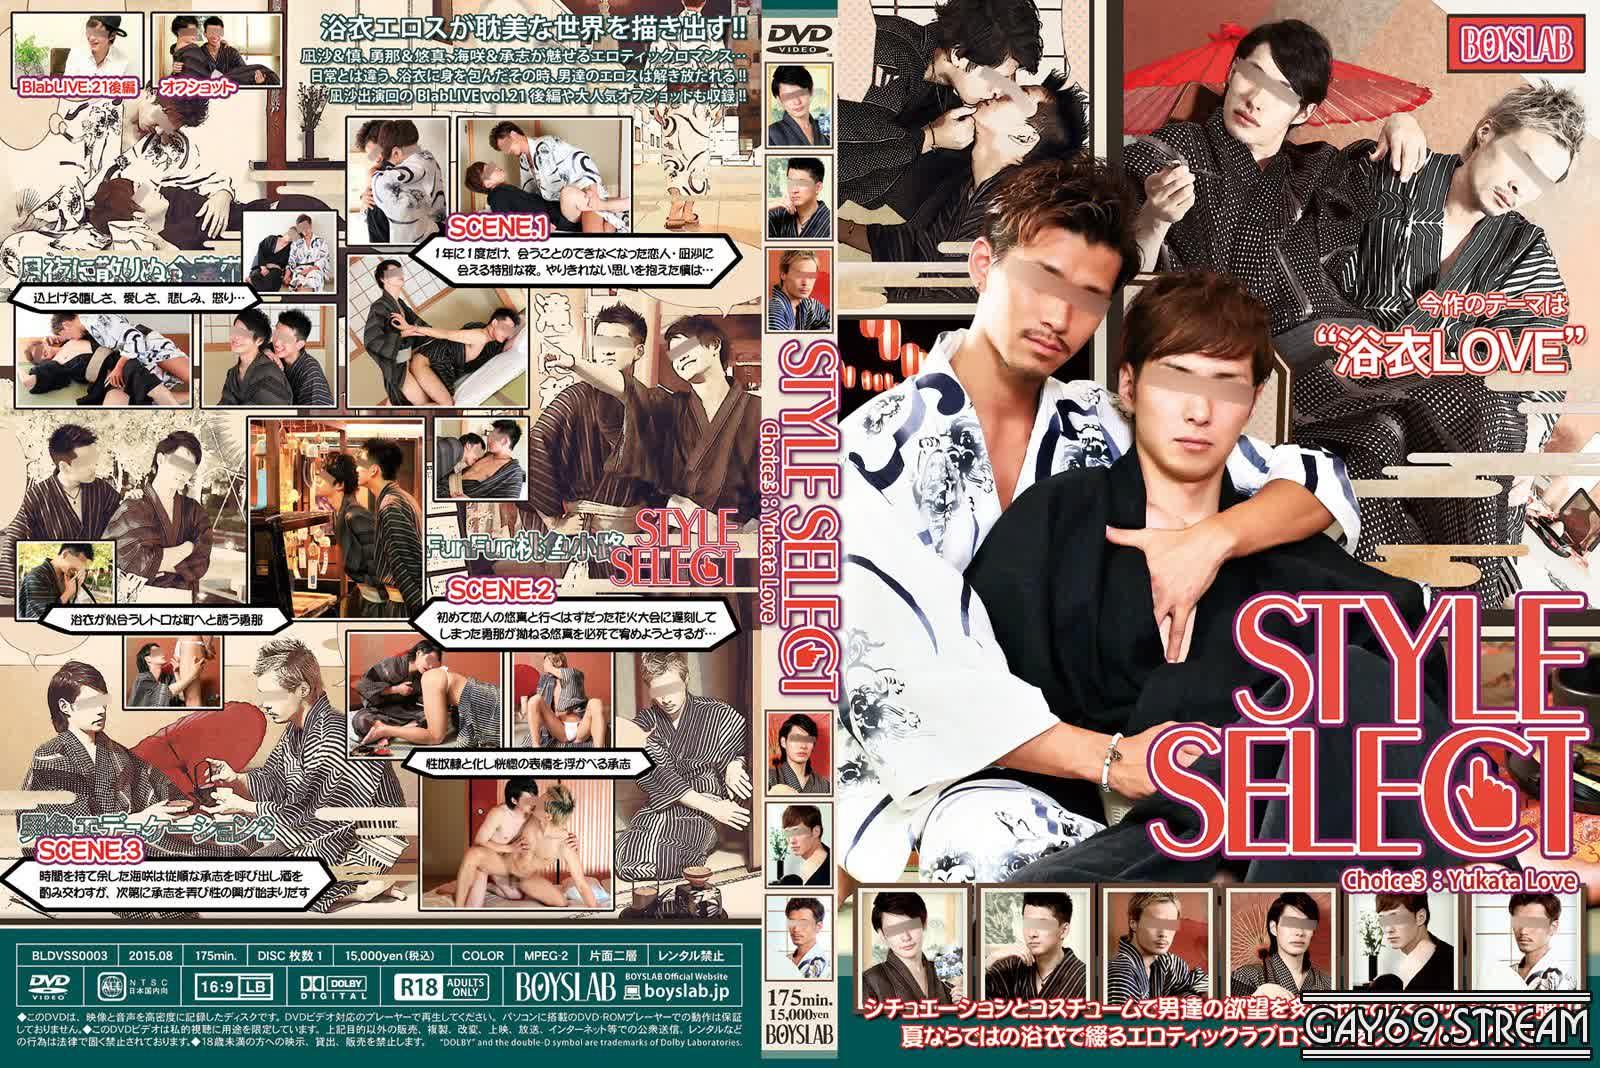 【BLDVSS0003】STYLE SELECT Choice3:Yukata Love